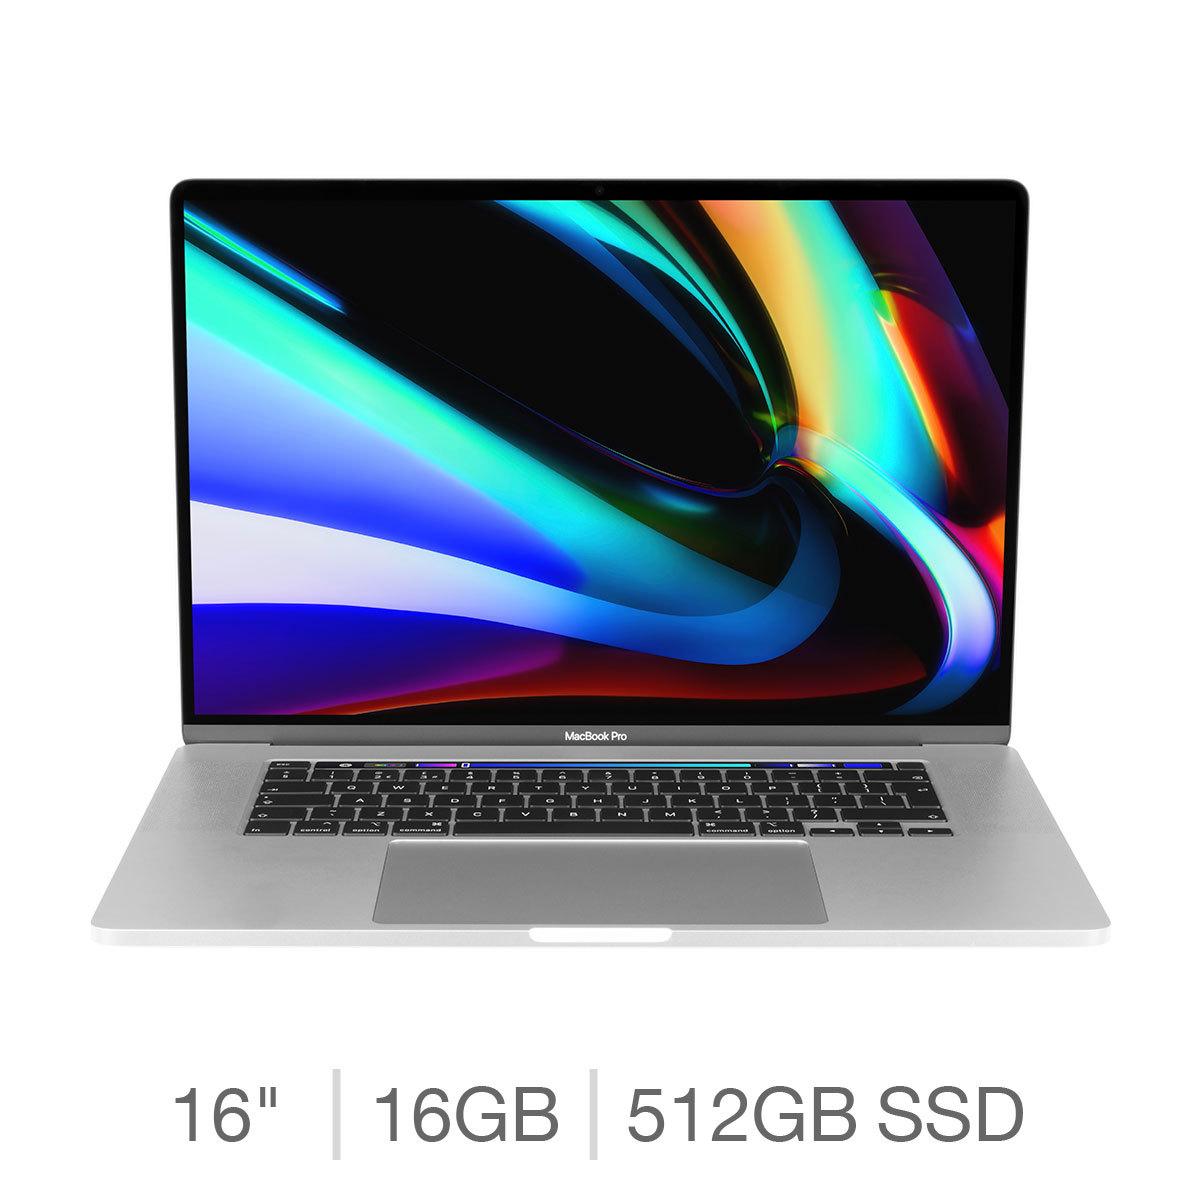 MacBook Pro 16-inch 16GB | 512GB £1889.99 delivered using code @ Costco